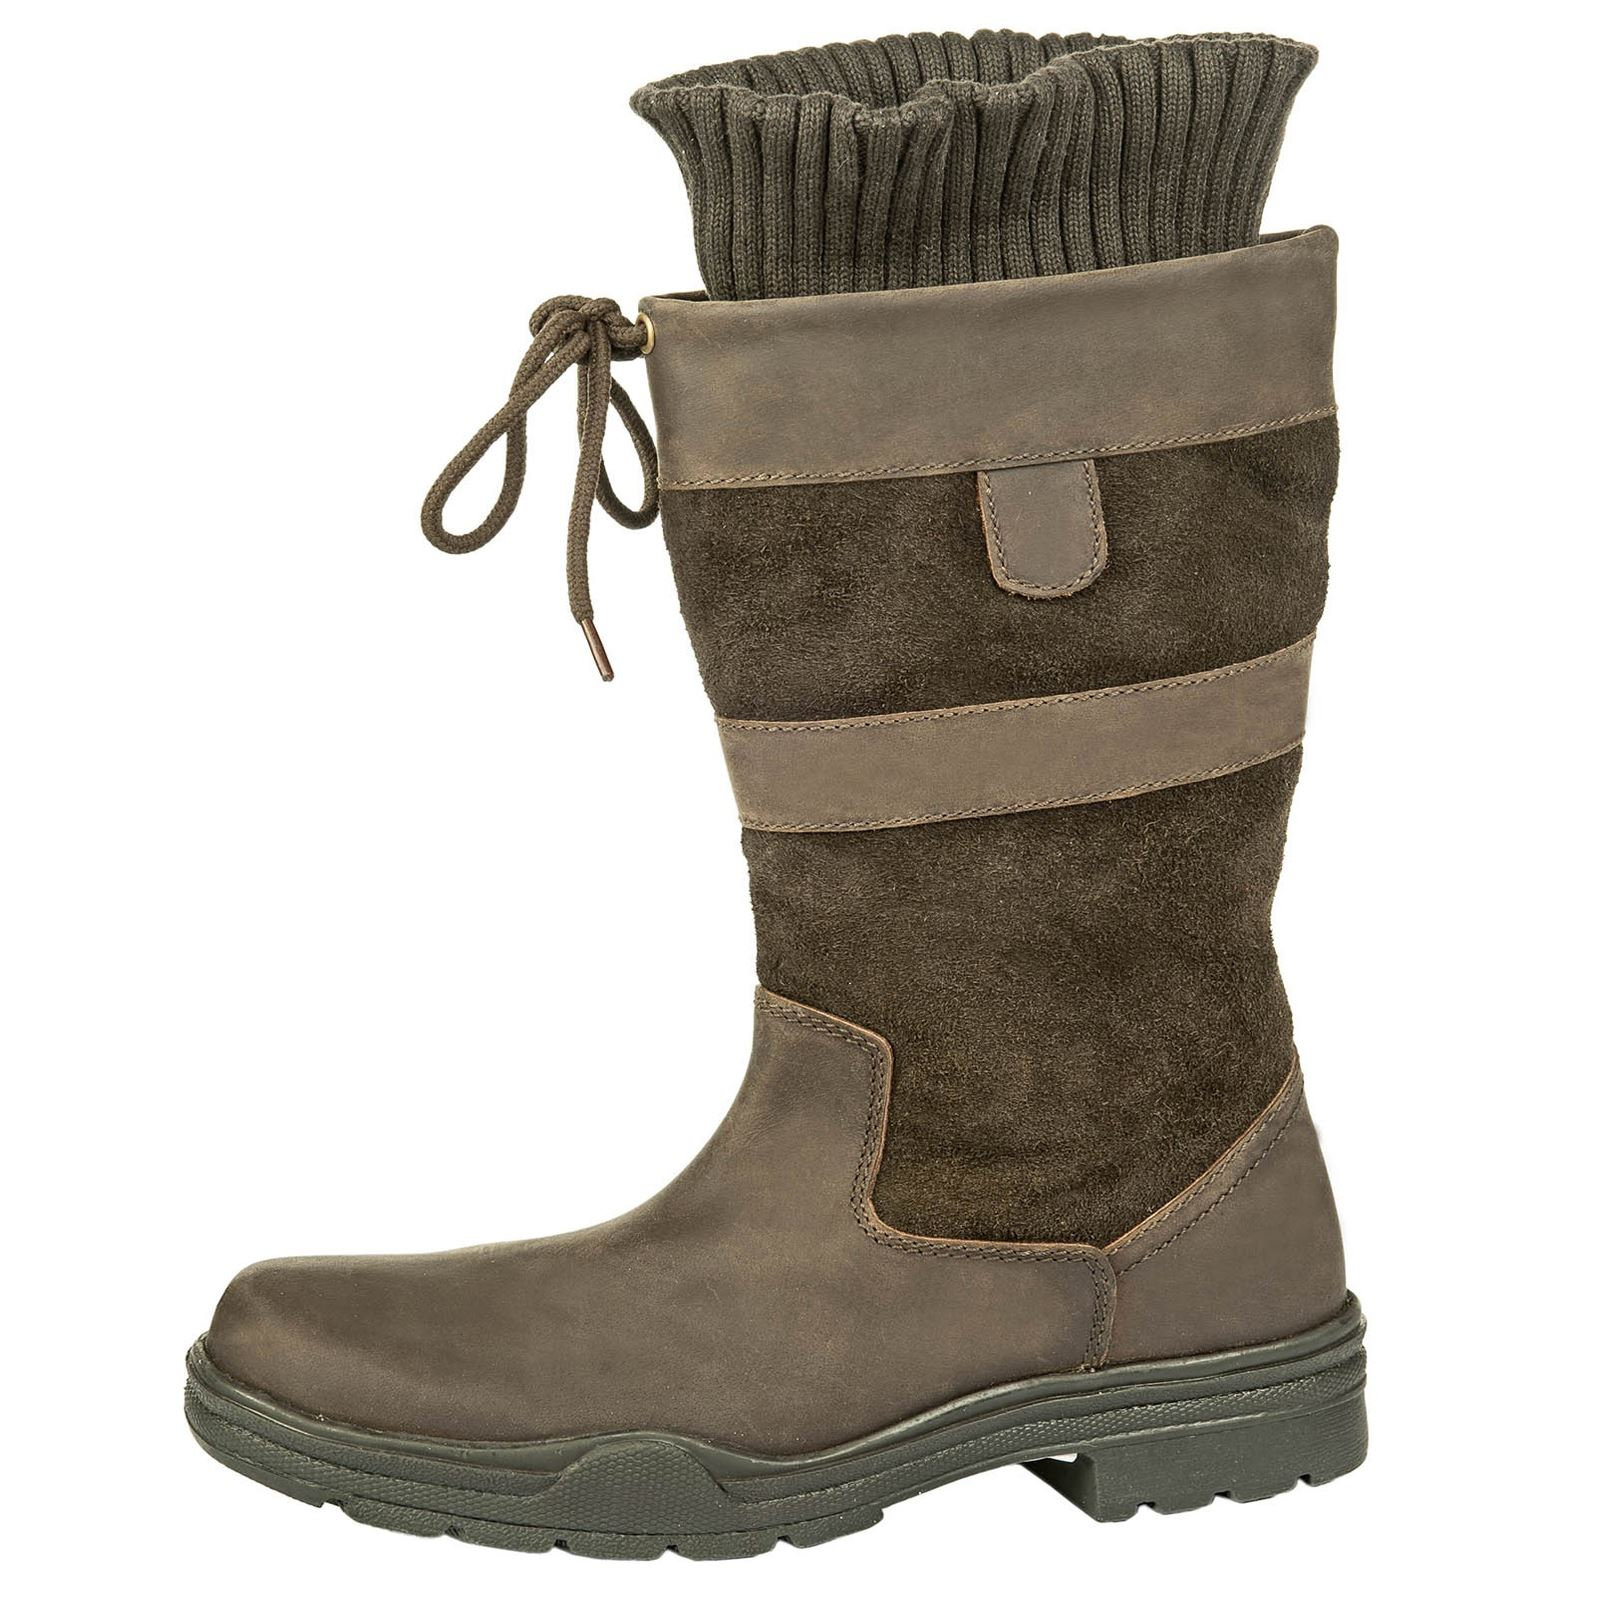 Boots 3 Durevole Hkm Trendy scuro Adulti Fashion 4 Impermeabile Belmond Marrone Spring Yard qnvwYWXvp